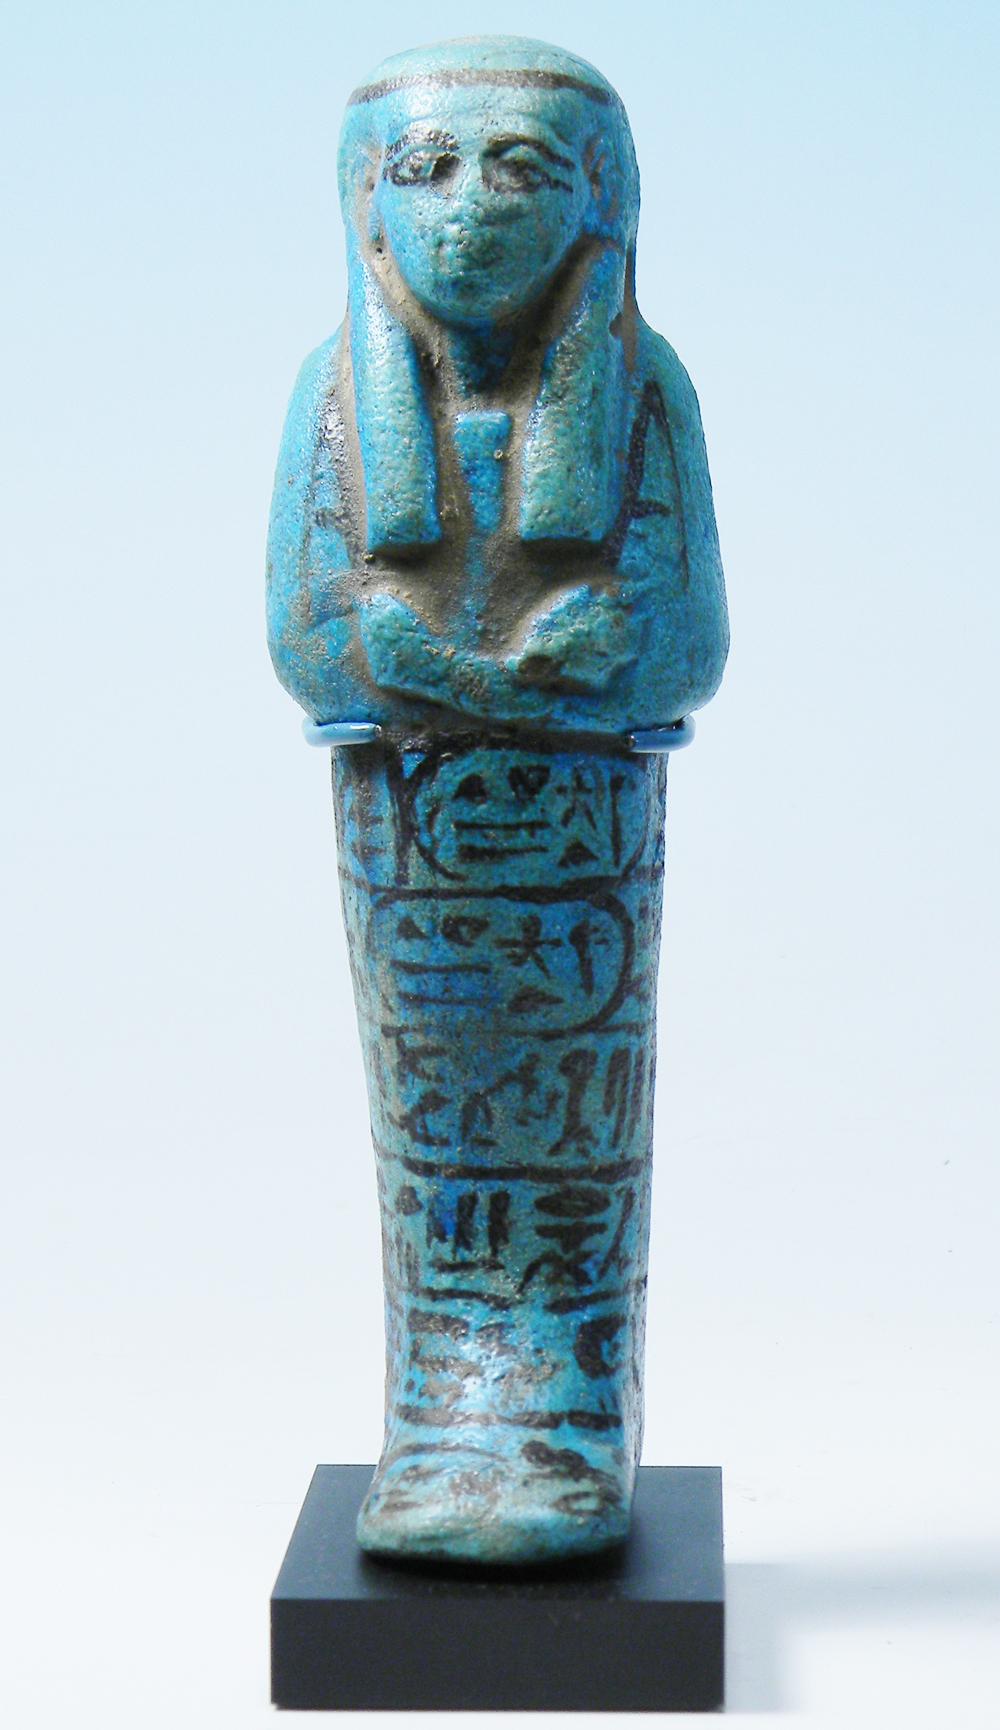 Hixenbaugh Ancient Art Presents Ramesside Period Egyptian